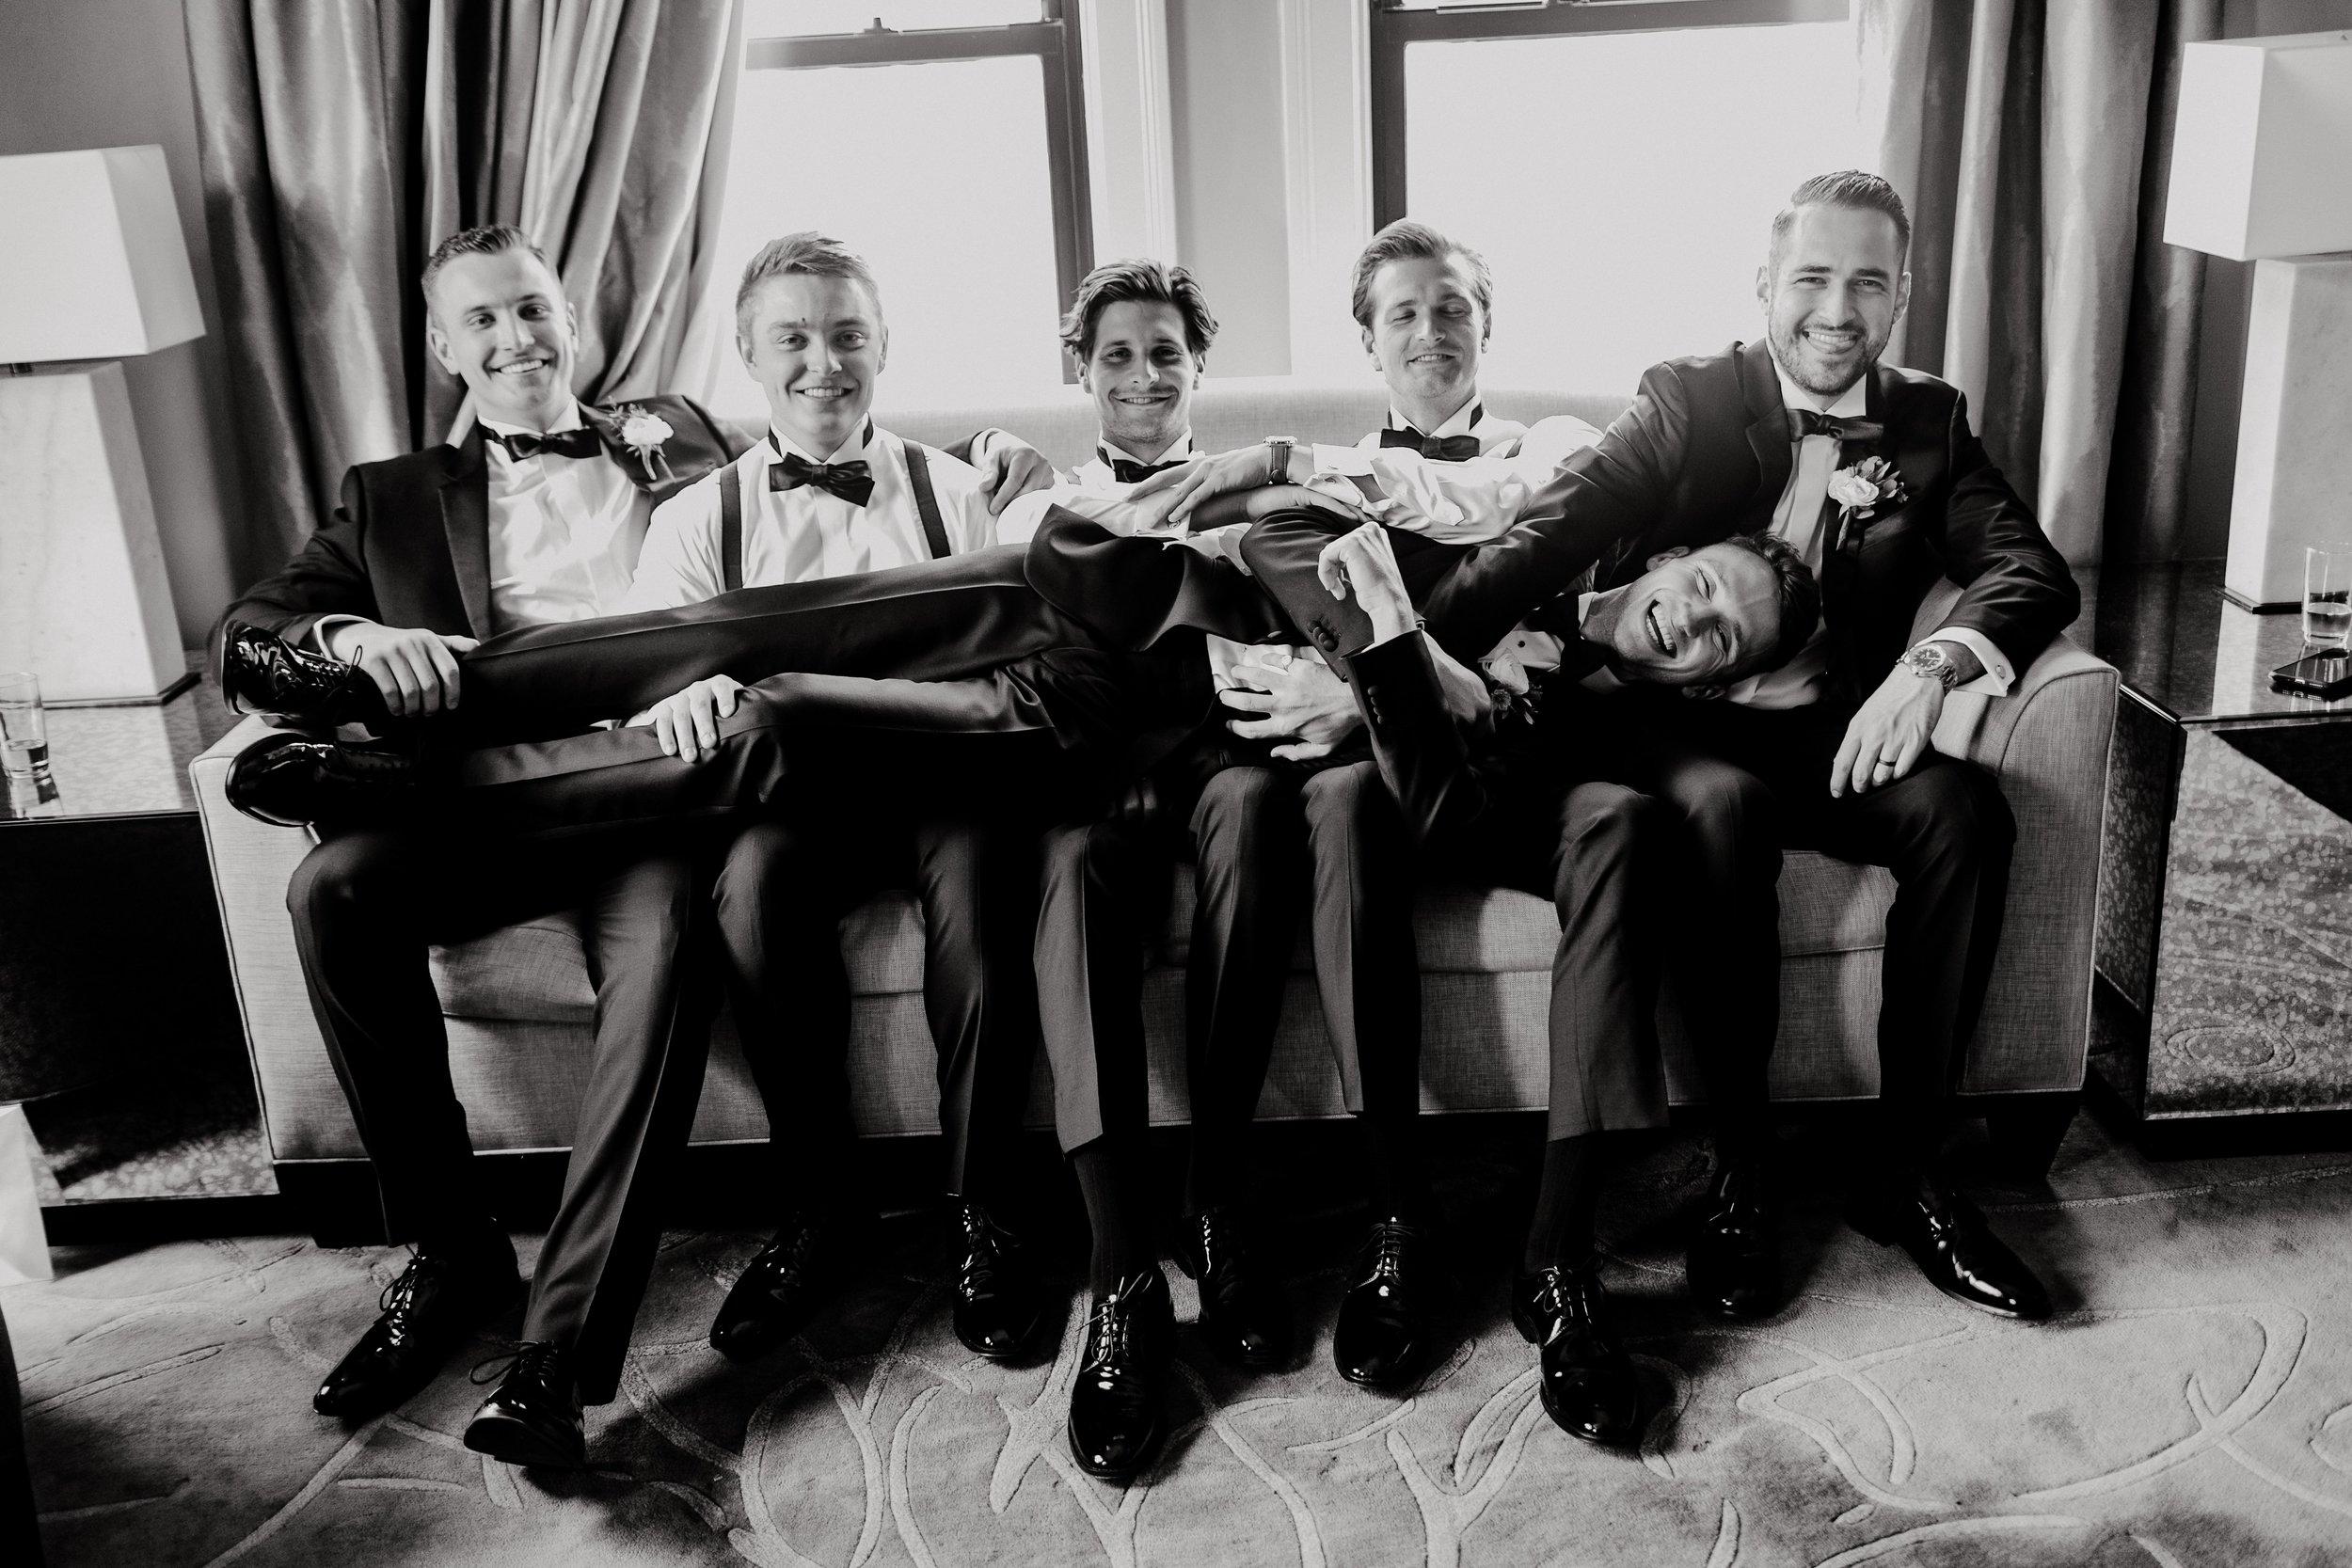 st-anthony-hotel-wedding-photography-10038san-antonio.JPG